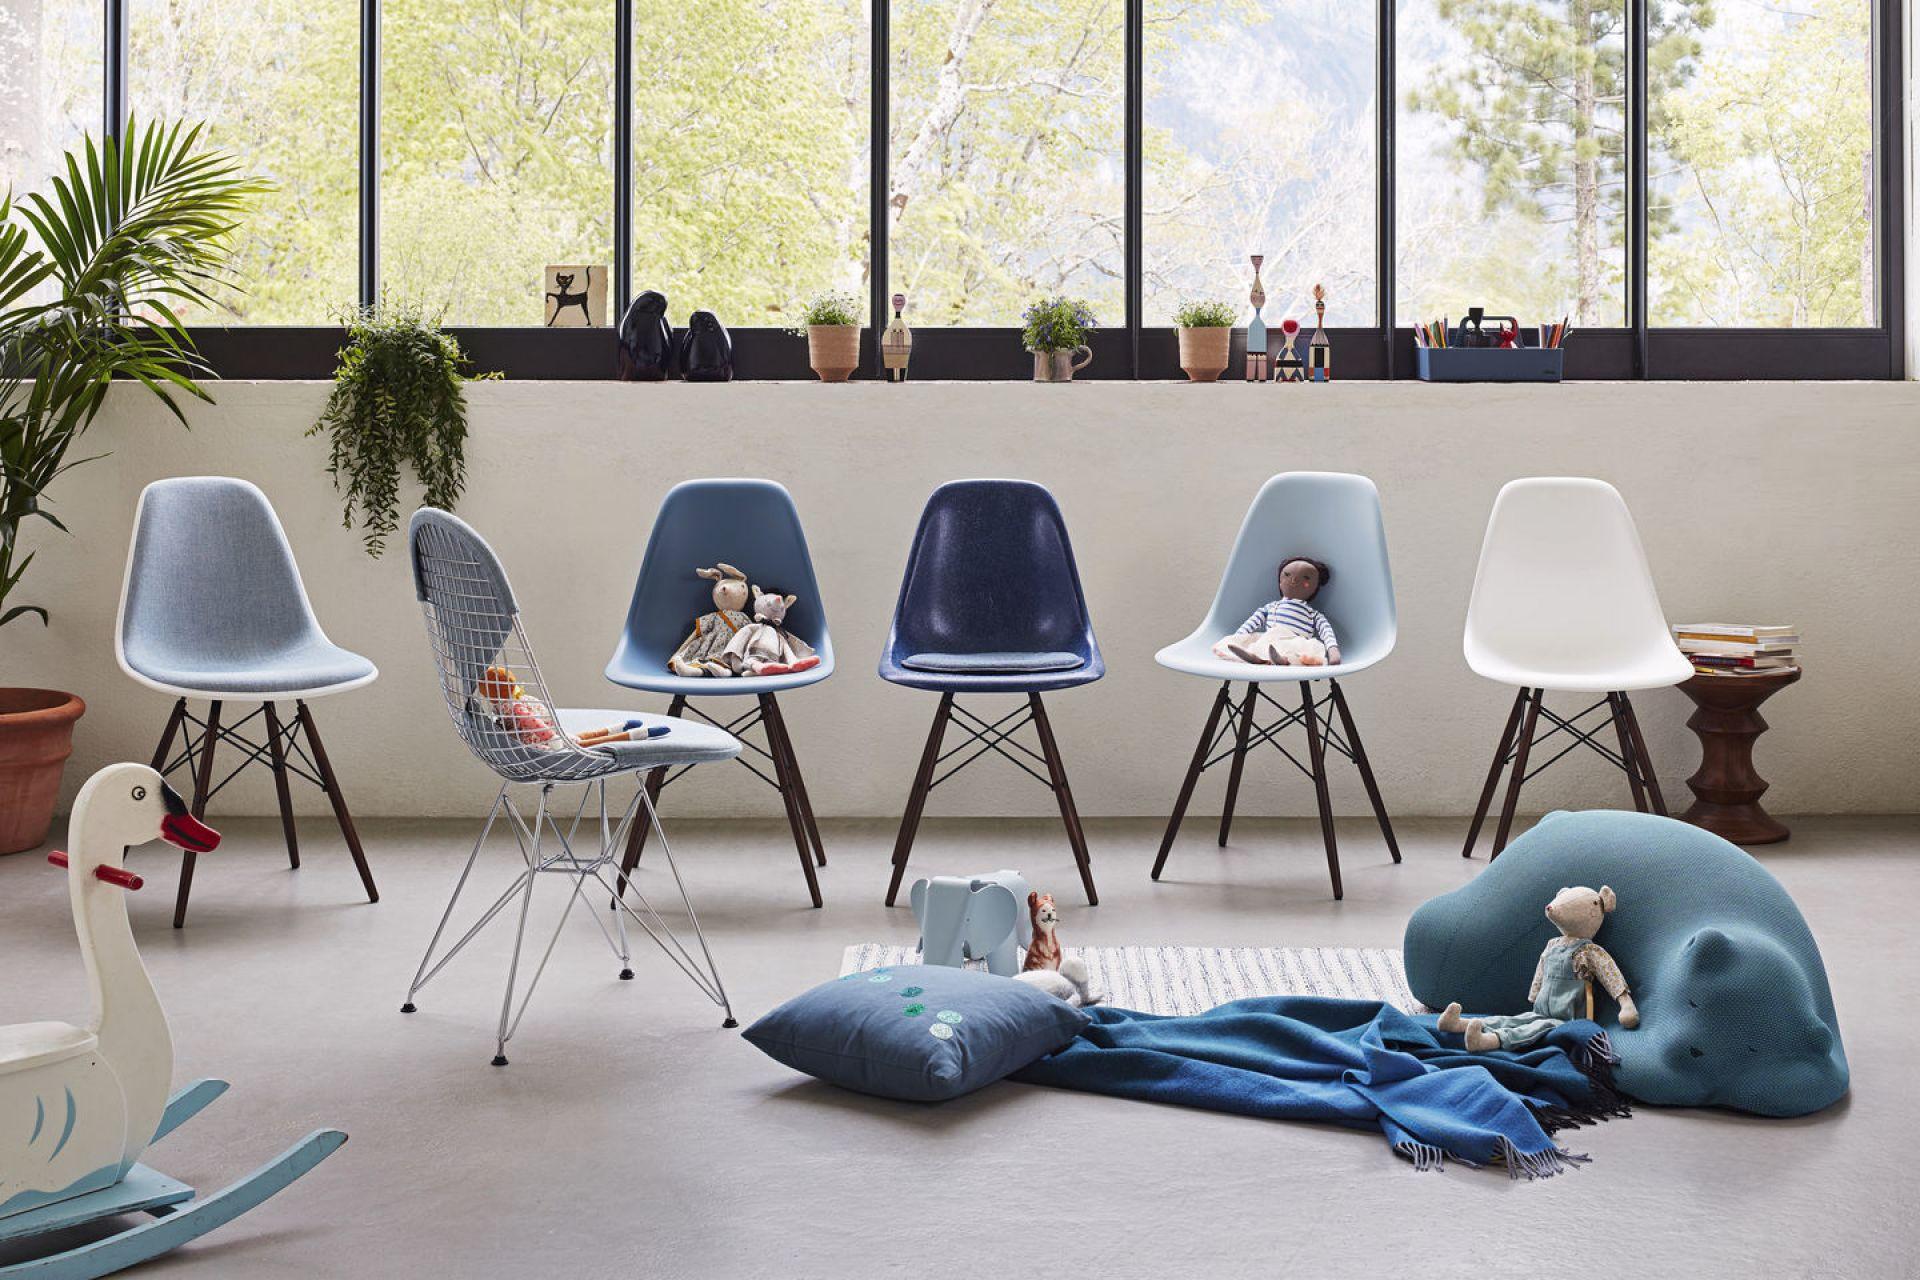 Eames Fiberglass Chair DSW Stuhl Vitra Farben 2019 Esche Honigfarben - Navy blue